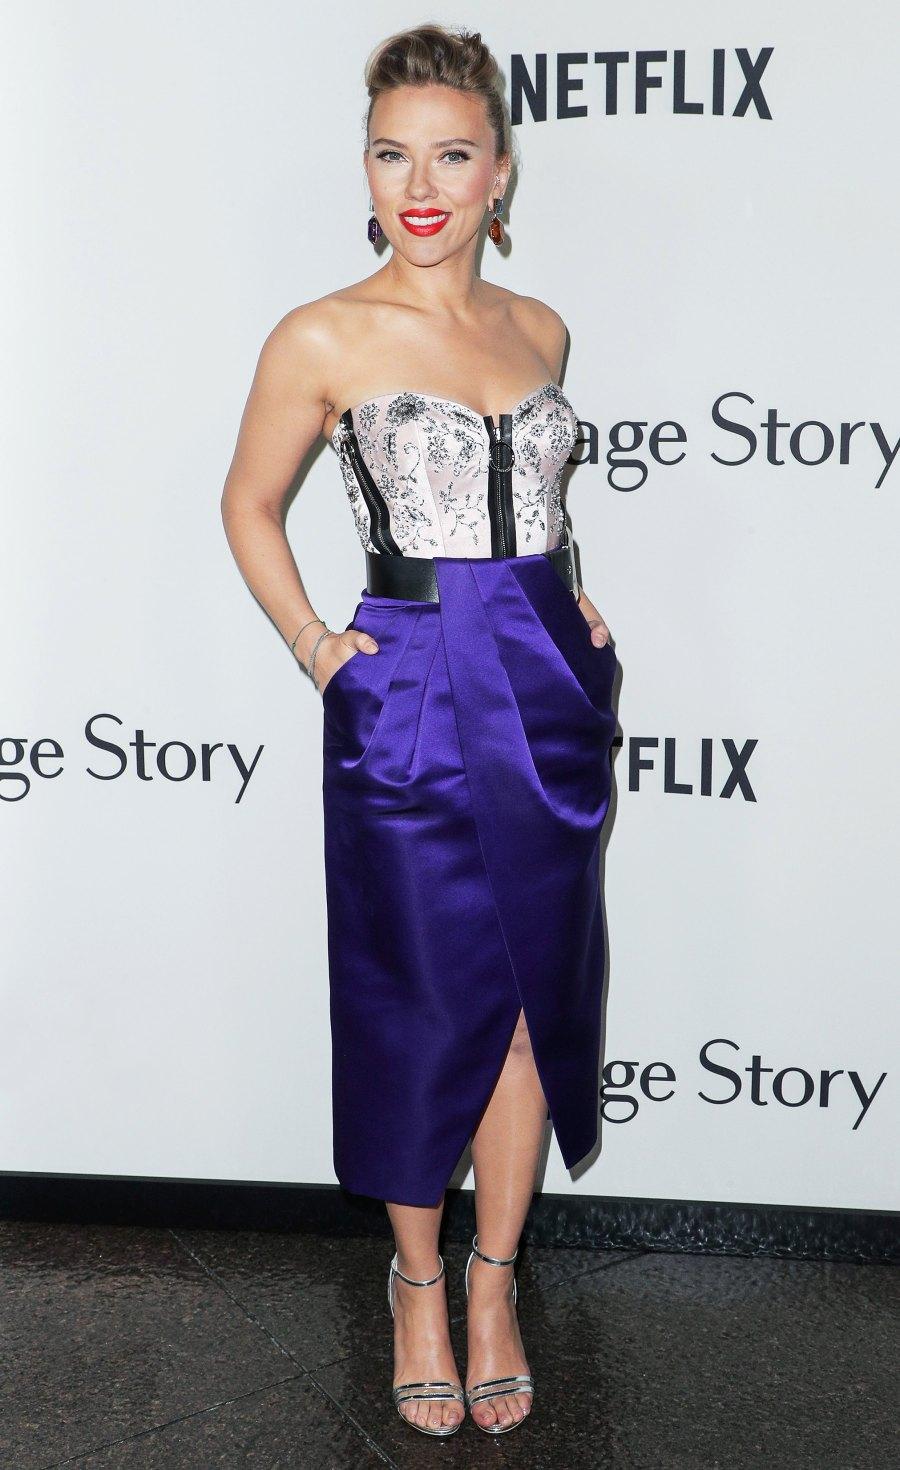 Scarlett Johansson Bustier Dress November 5, 2019